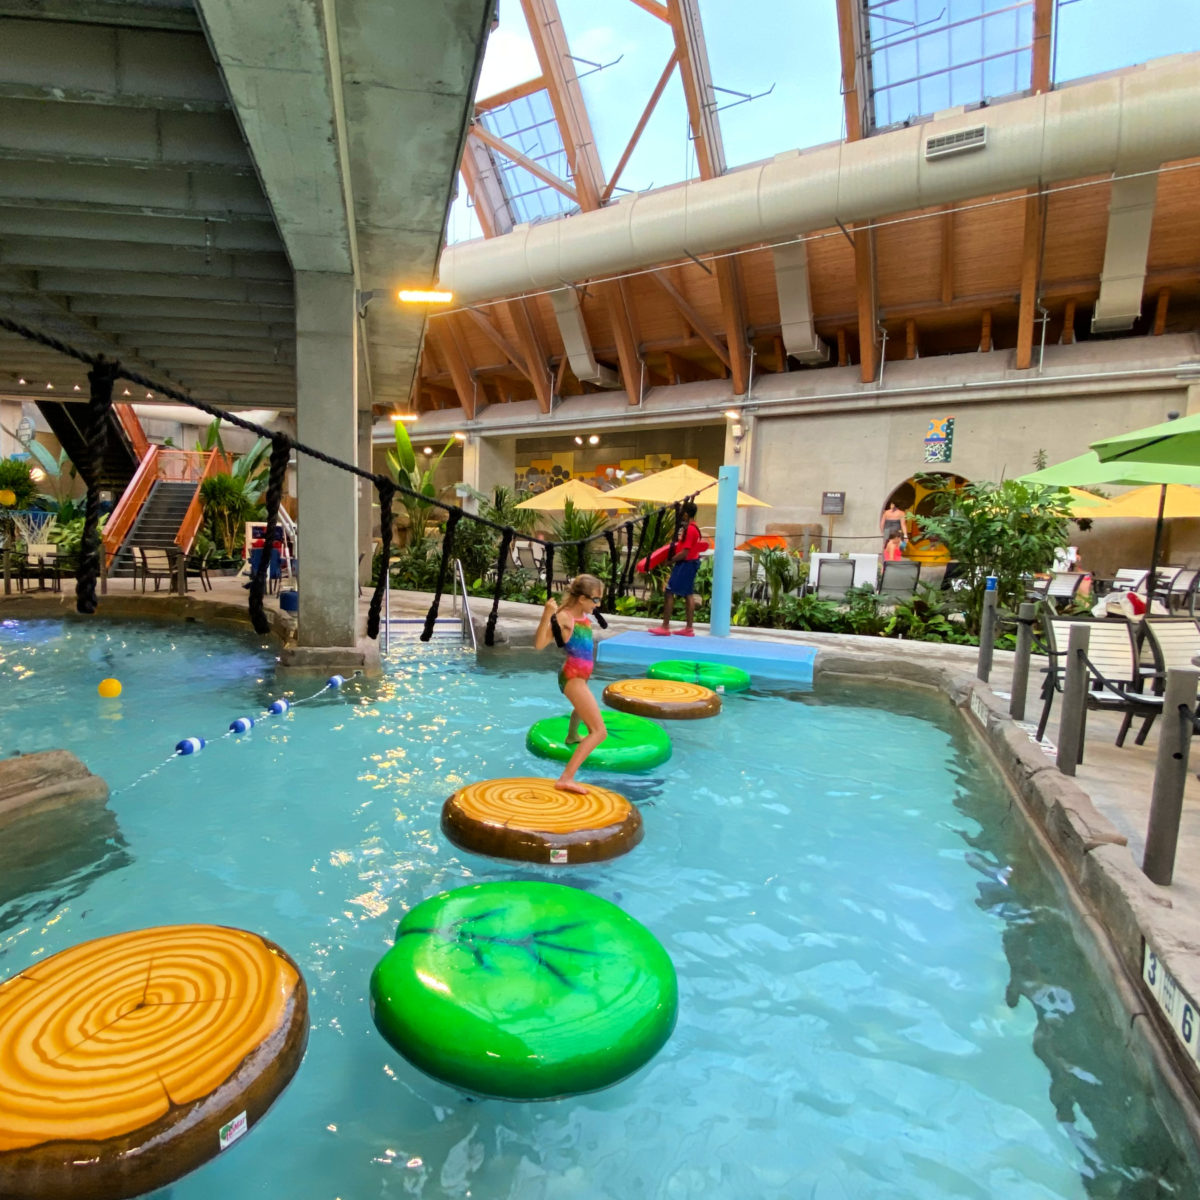 Kartrite Resort Waterpark, Monticello New York Catskills